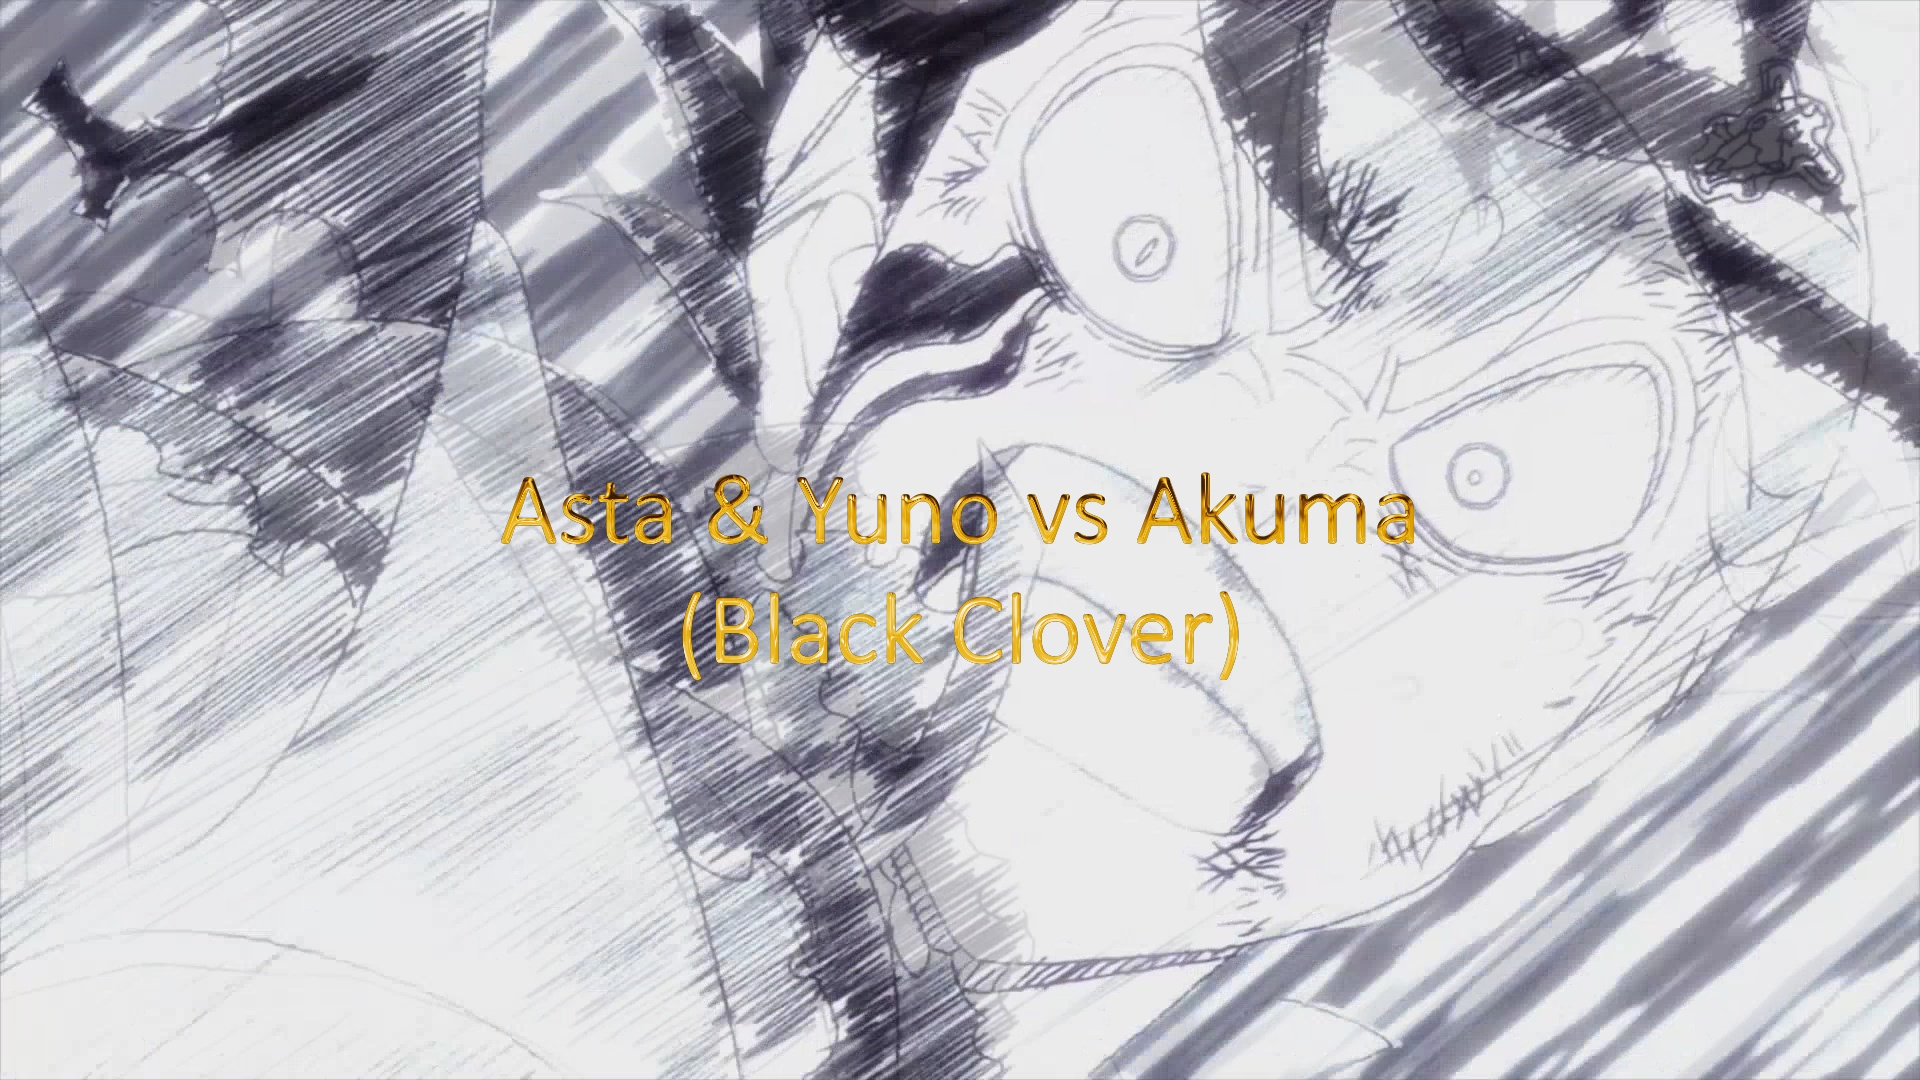 Best Fights Anime 2020 Black Clover